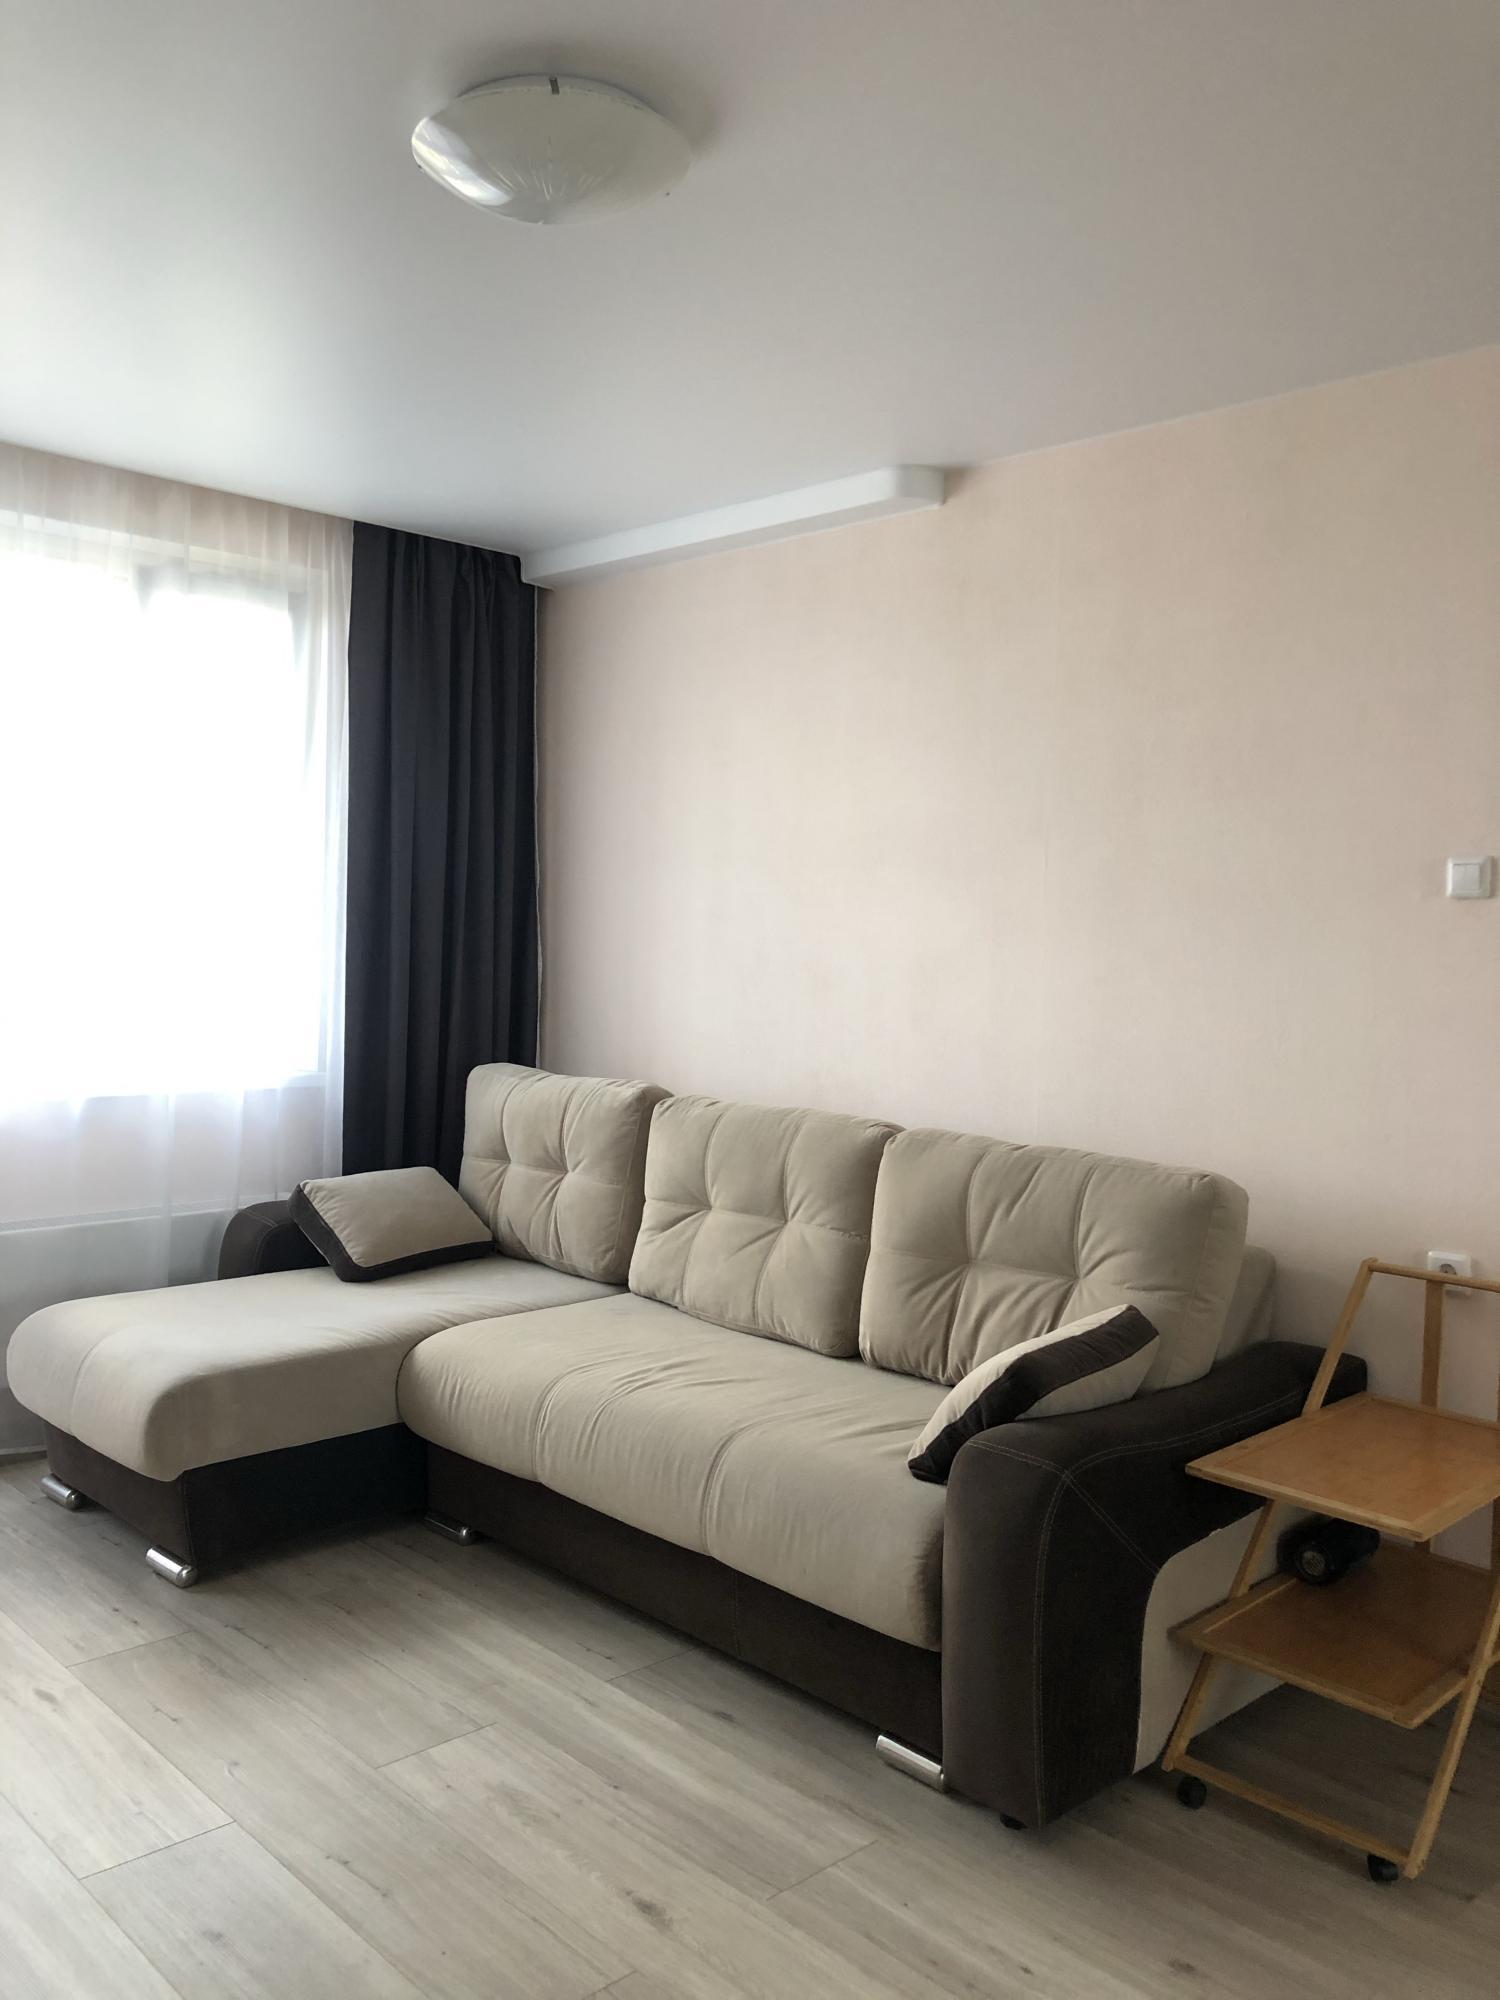 Квартира, 1 комната, 38.5 м² в Юбилейном 89261770666 купить 2